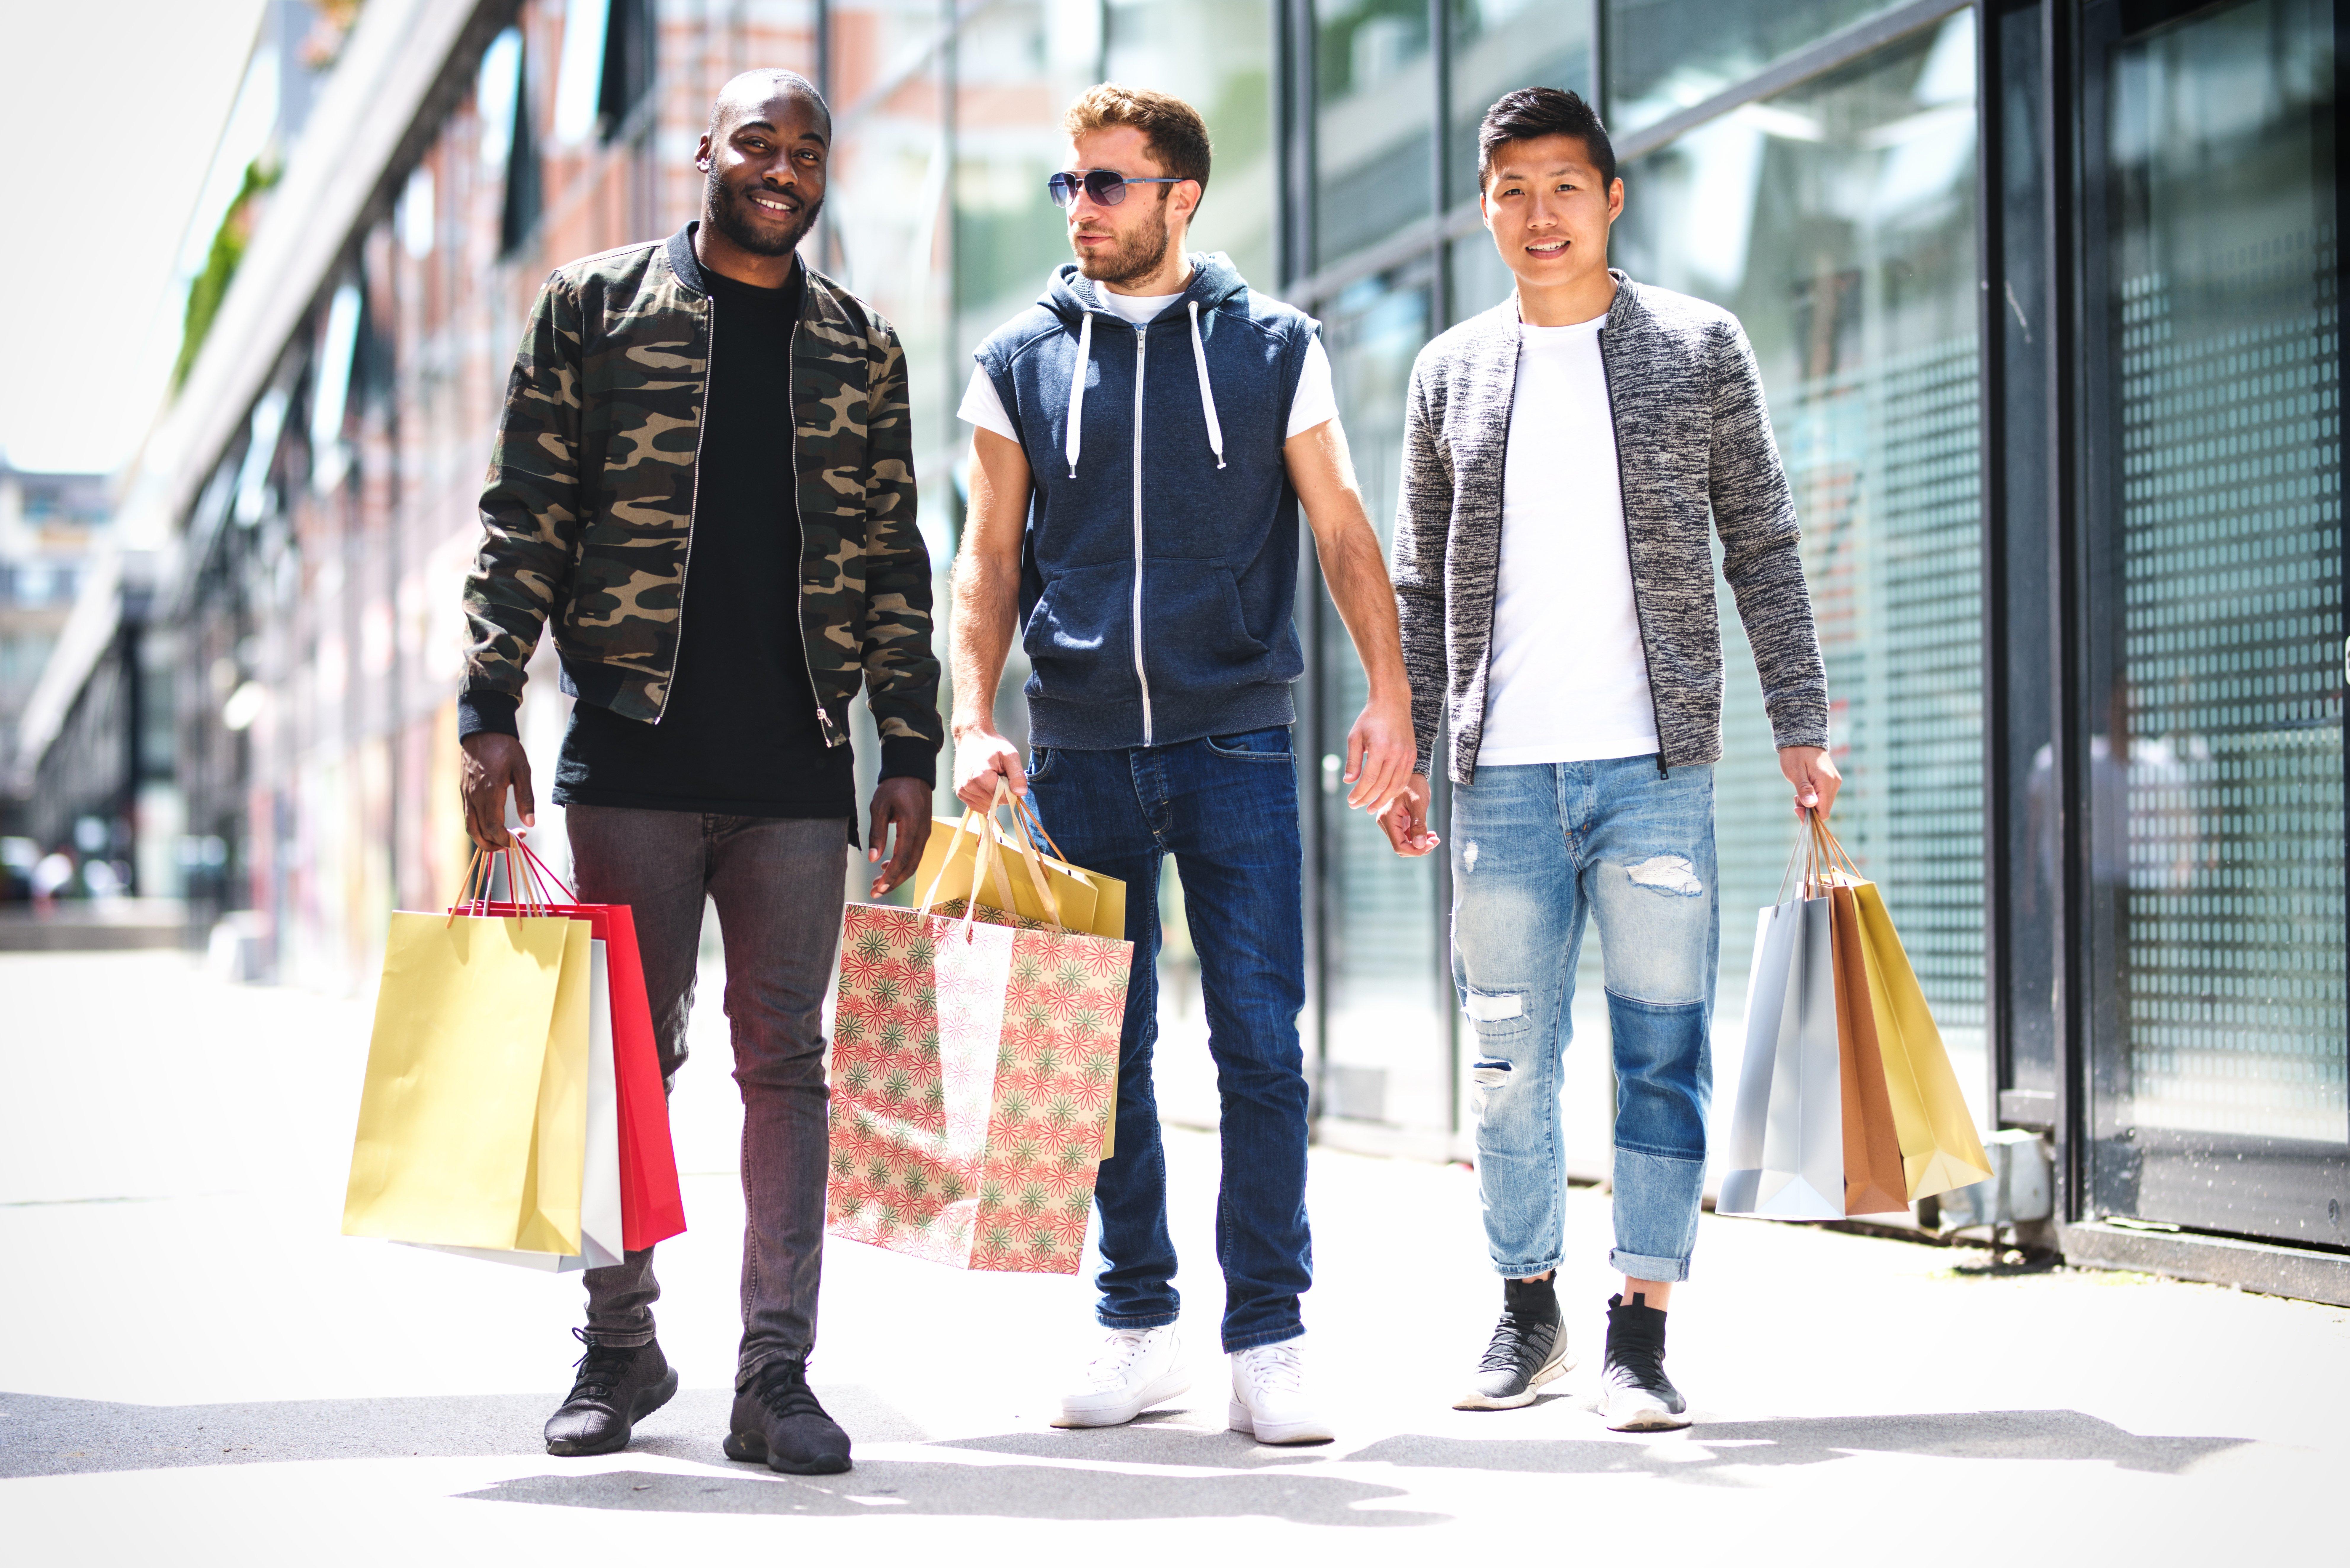 onsite inspection boys shopping spree